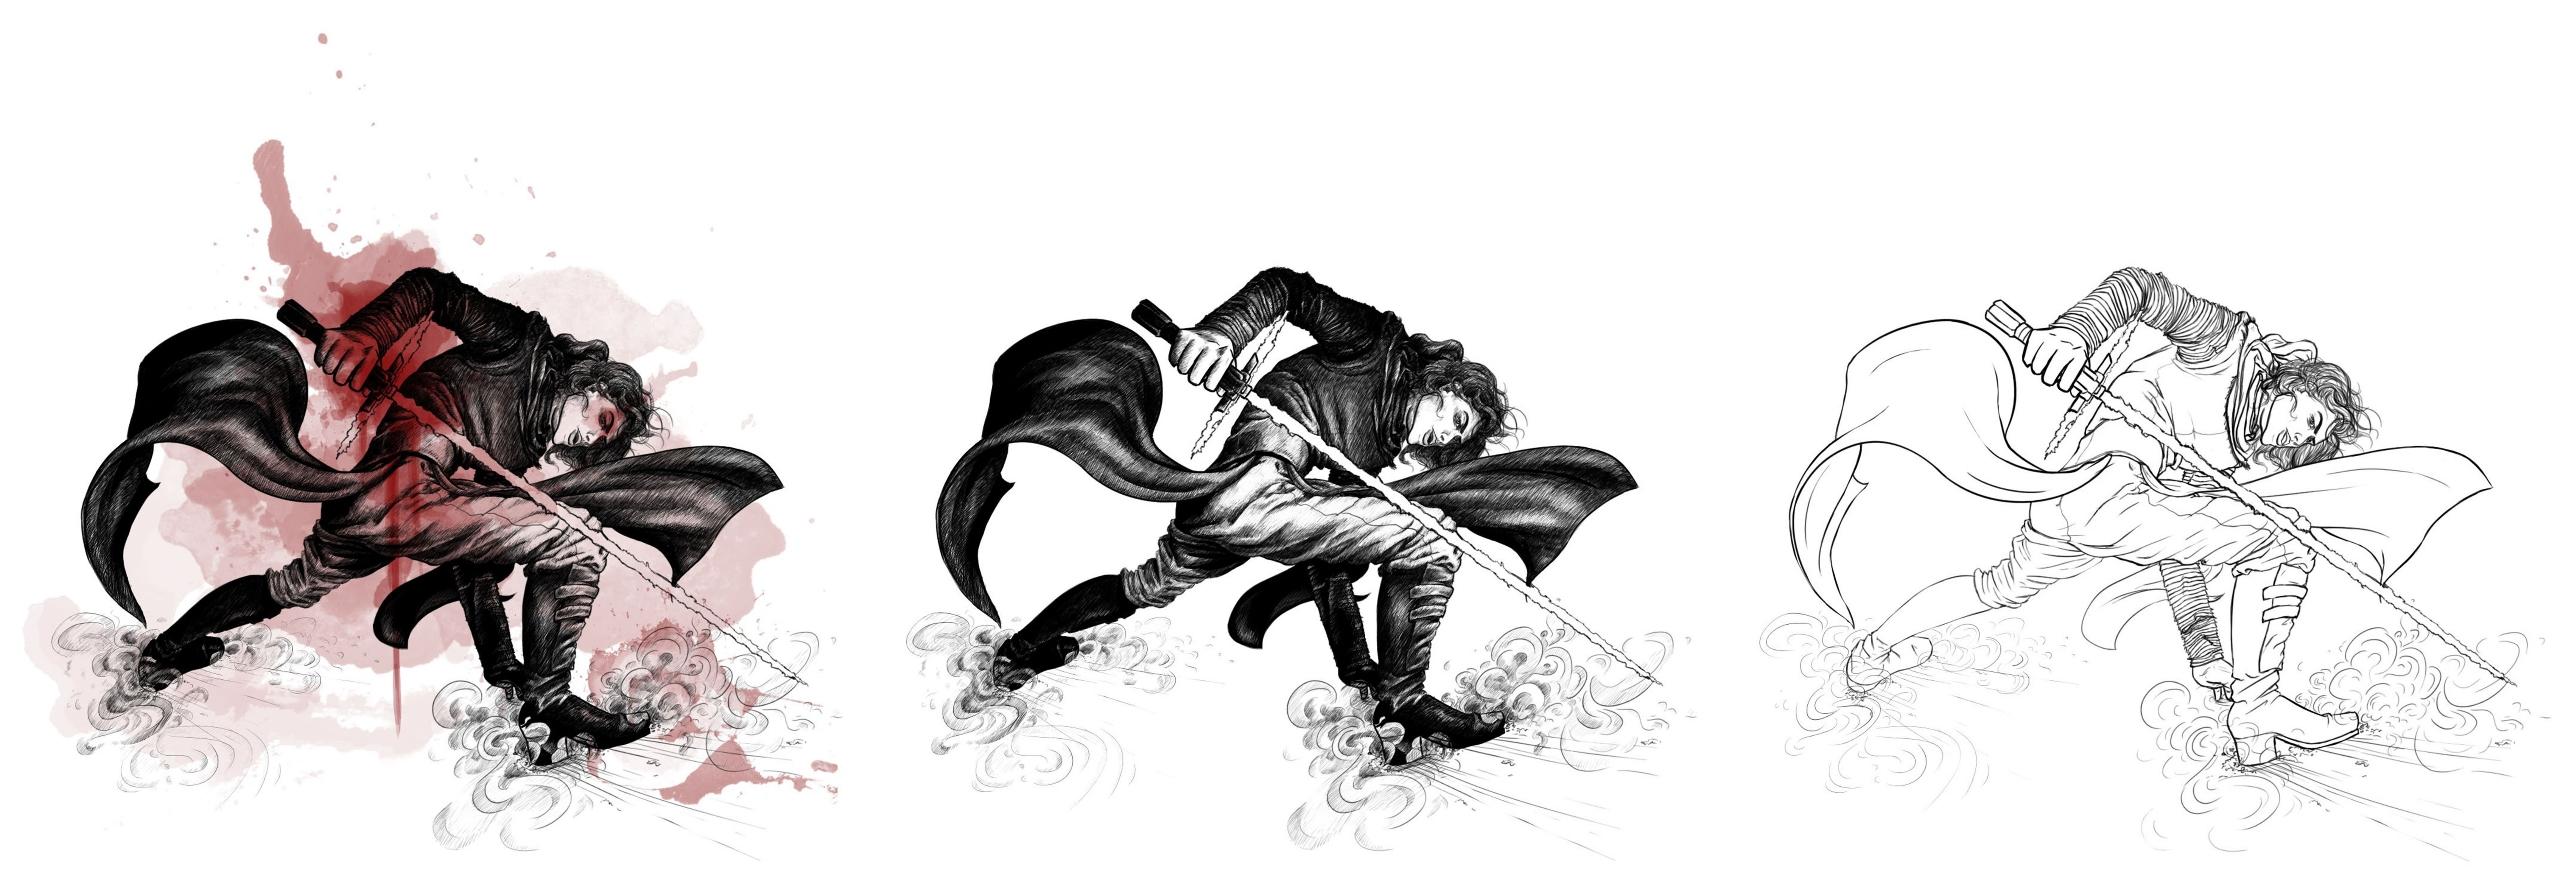 Hollō- Jessica Dwning (@holloillustration) Cover Image